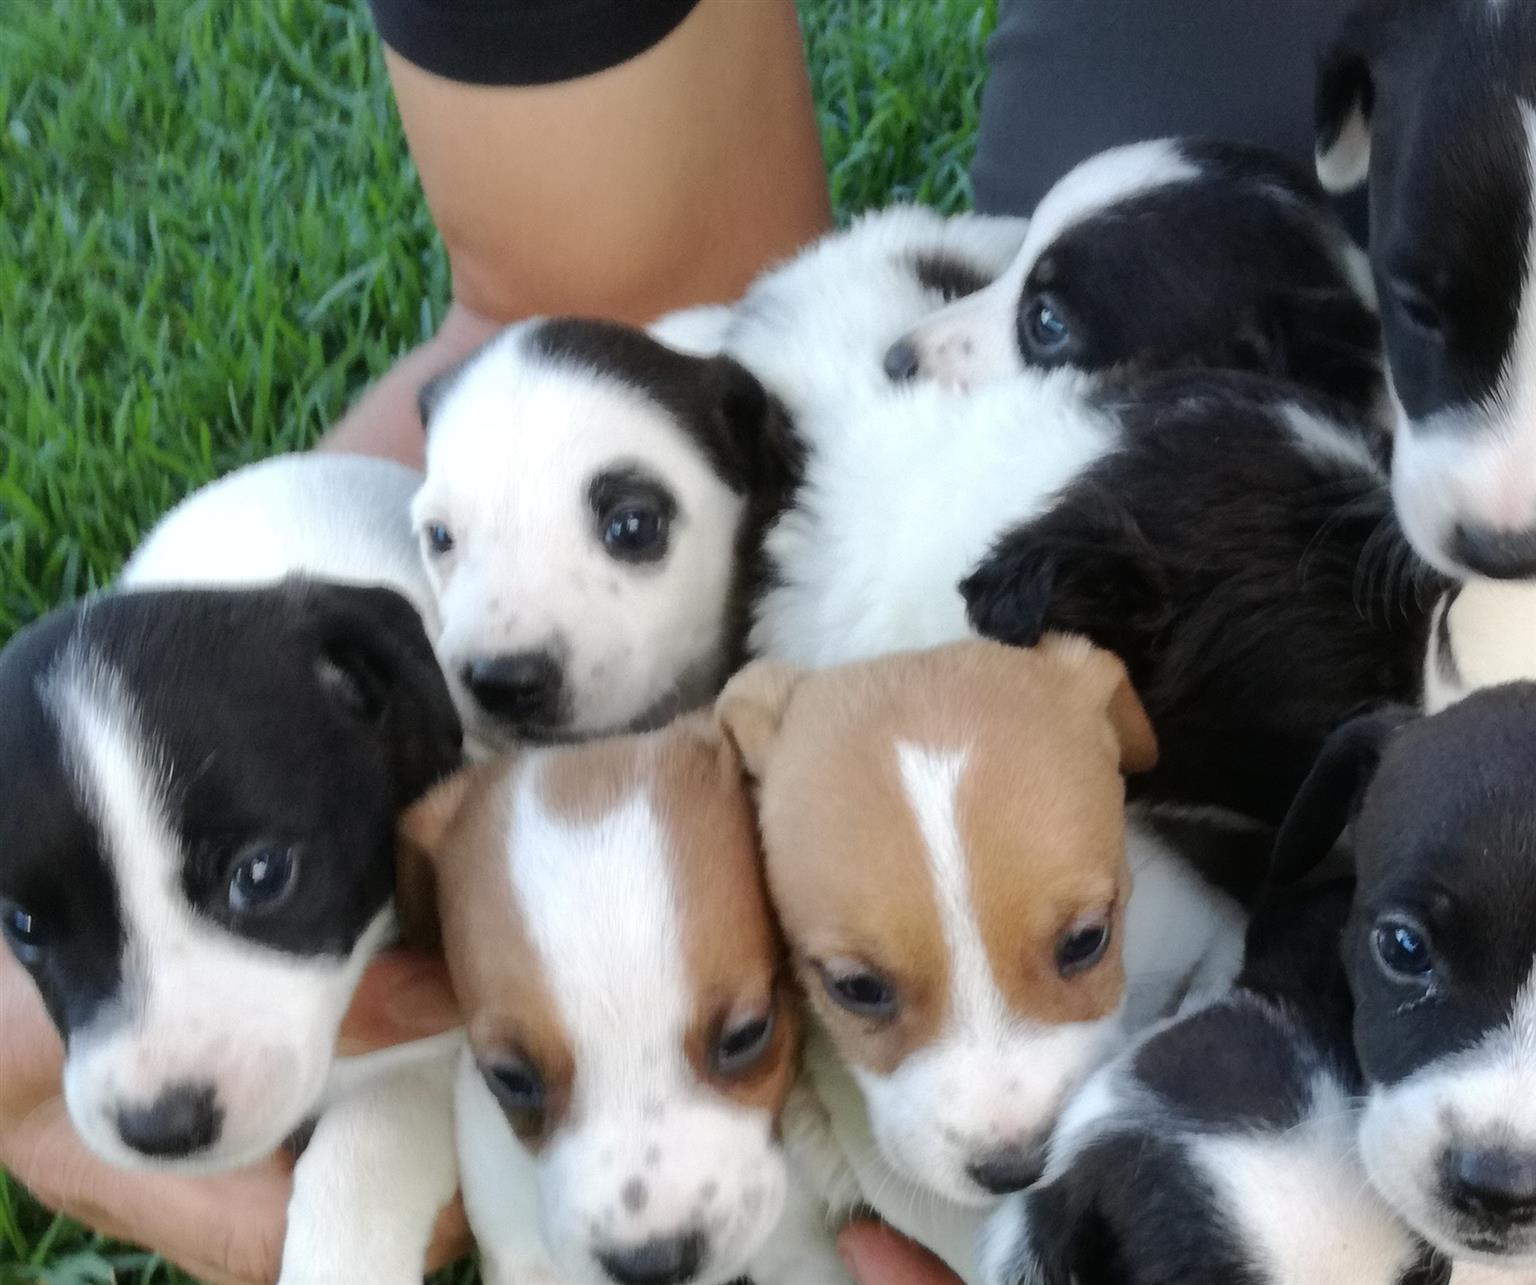 Jack Russell /Fox terrier puppies